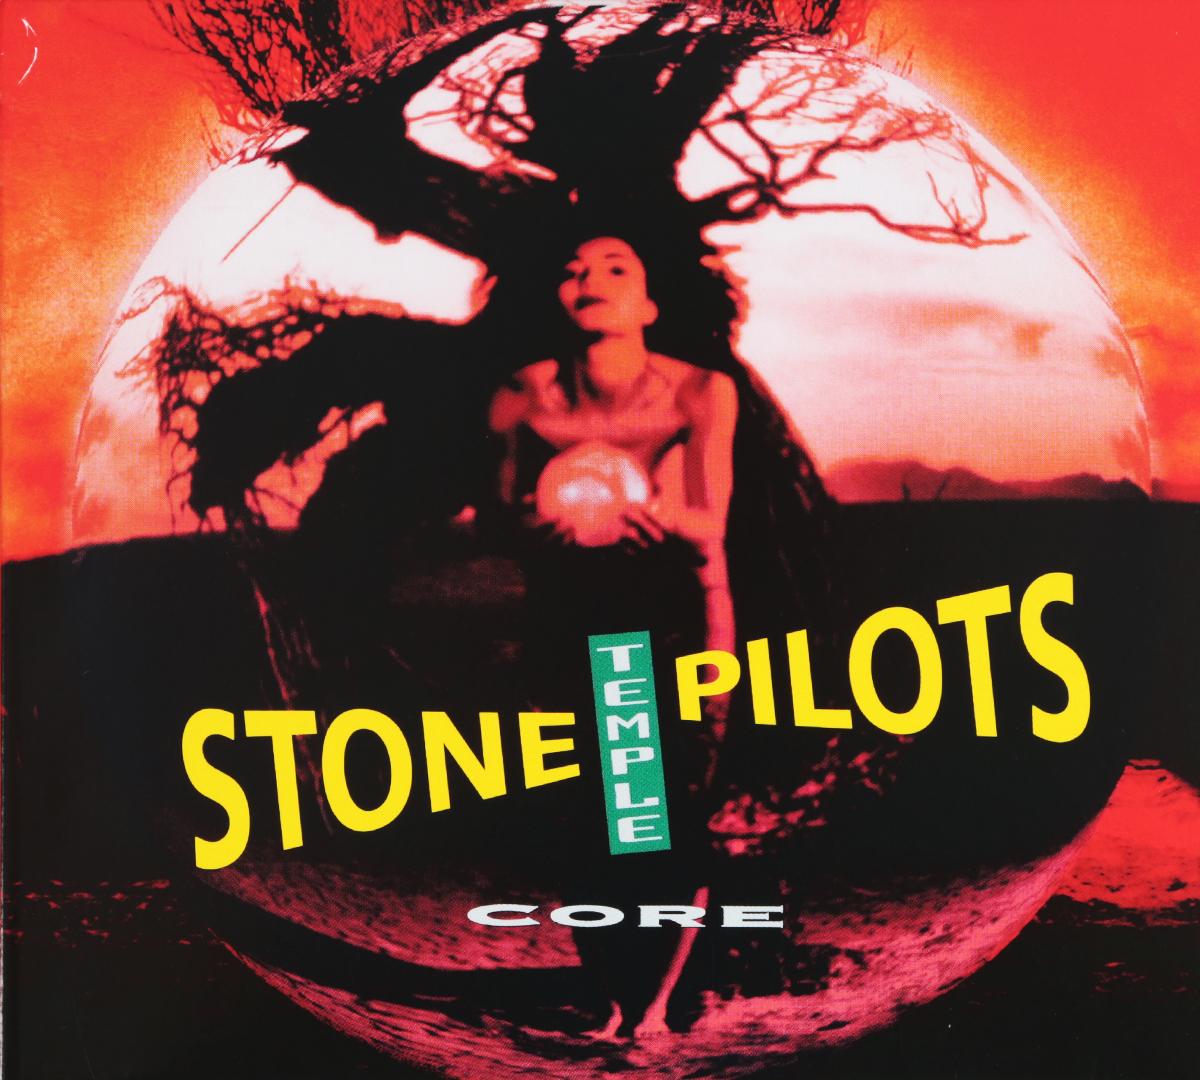 Stone Temple Pilots. Core (25Th Anniversary) (2 CD) portrait drawing 25th anniversary